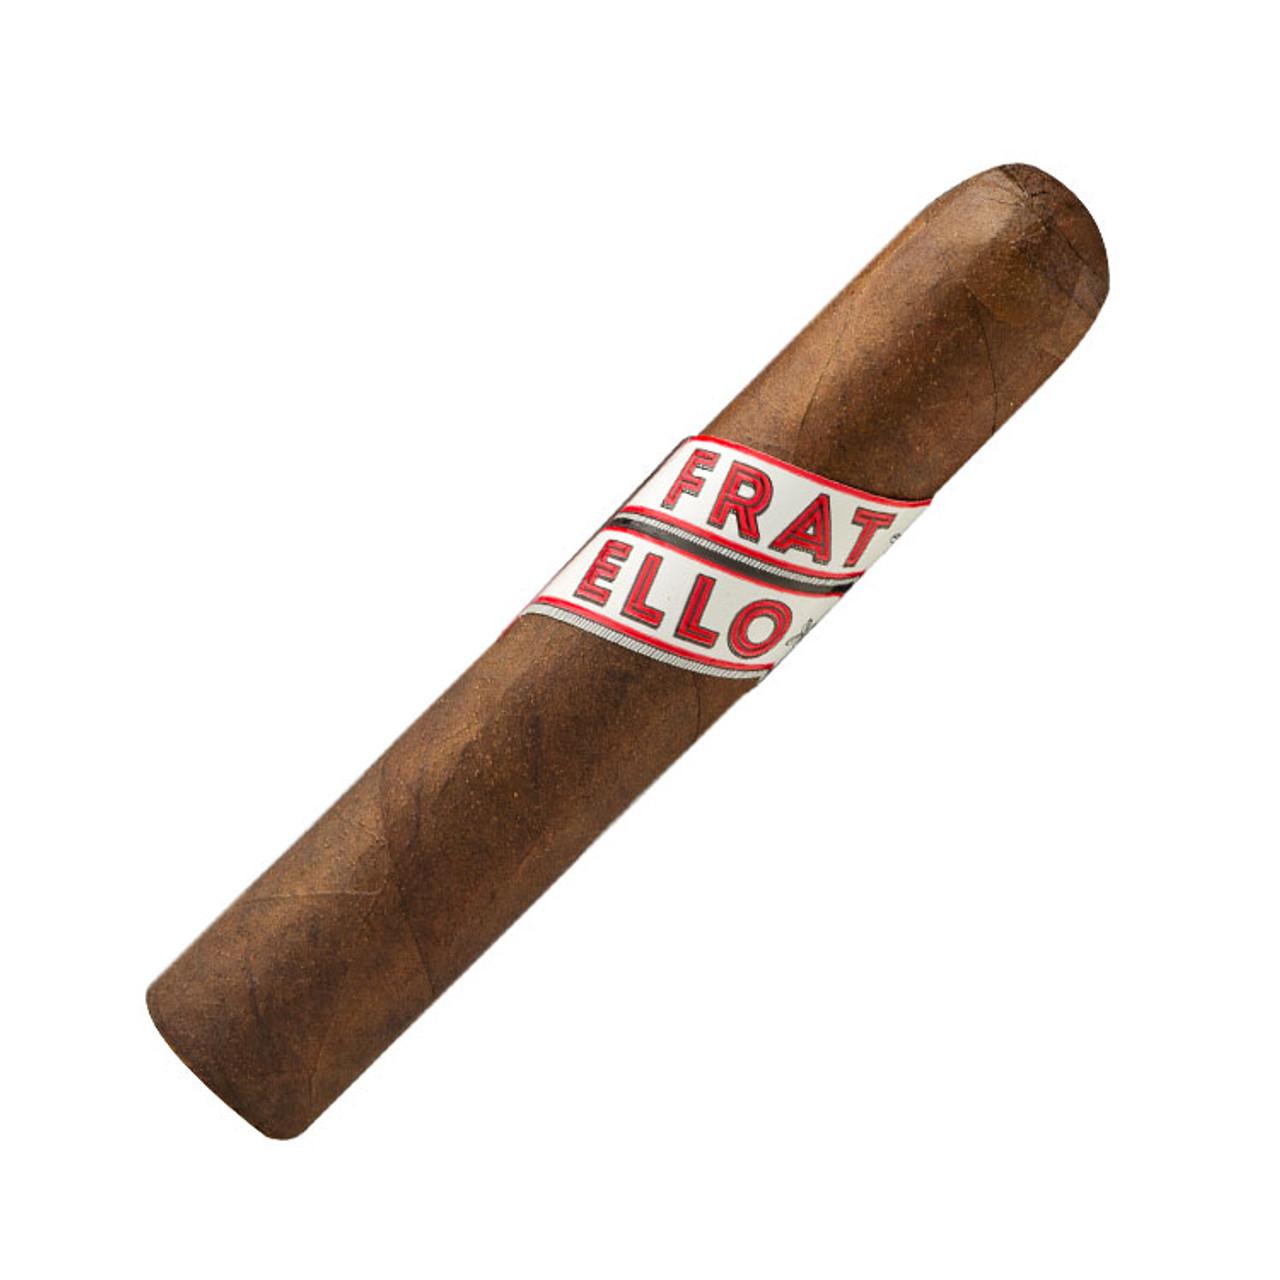 Fratello Bianco Bianco III Cigars - 5 x 56 (Box of 20)